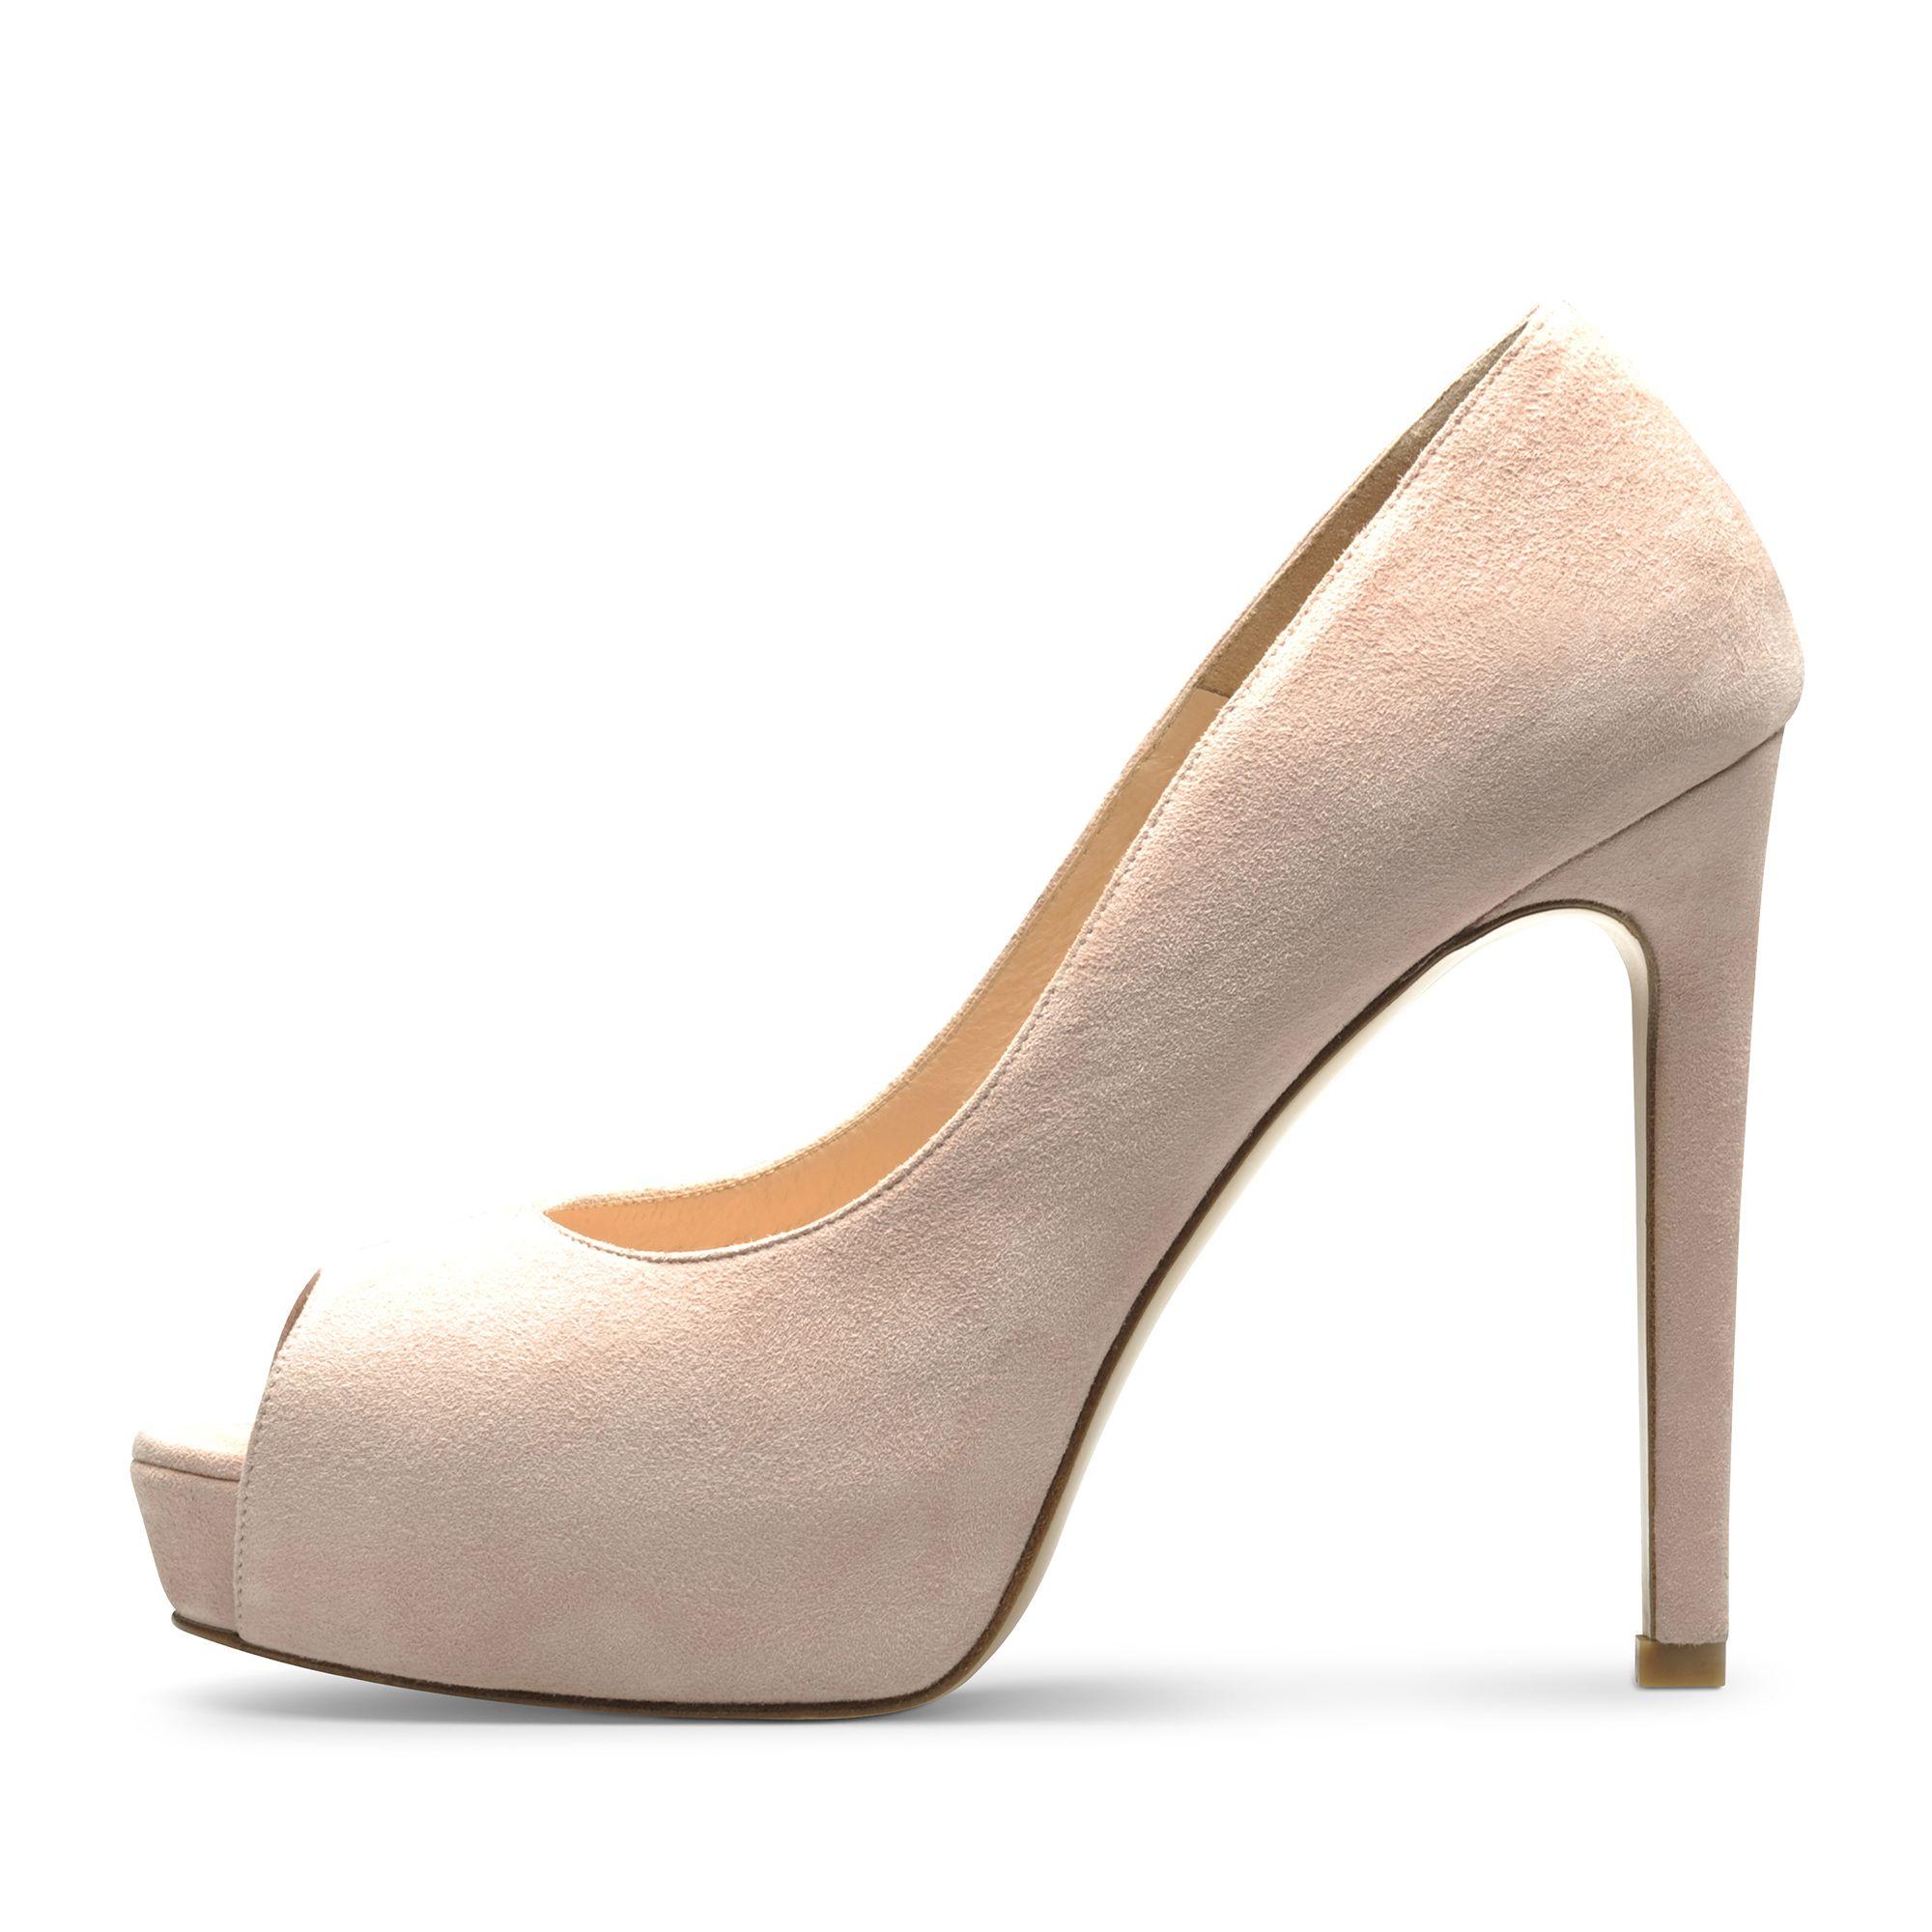 Beppina Altrosa Schuhe Damen Damenschuhe Pumps